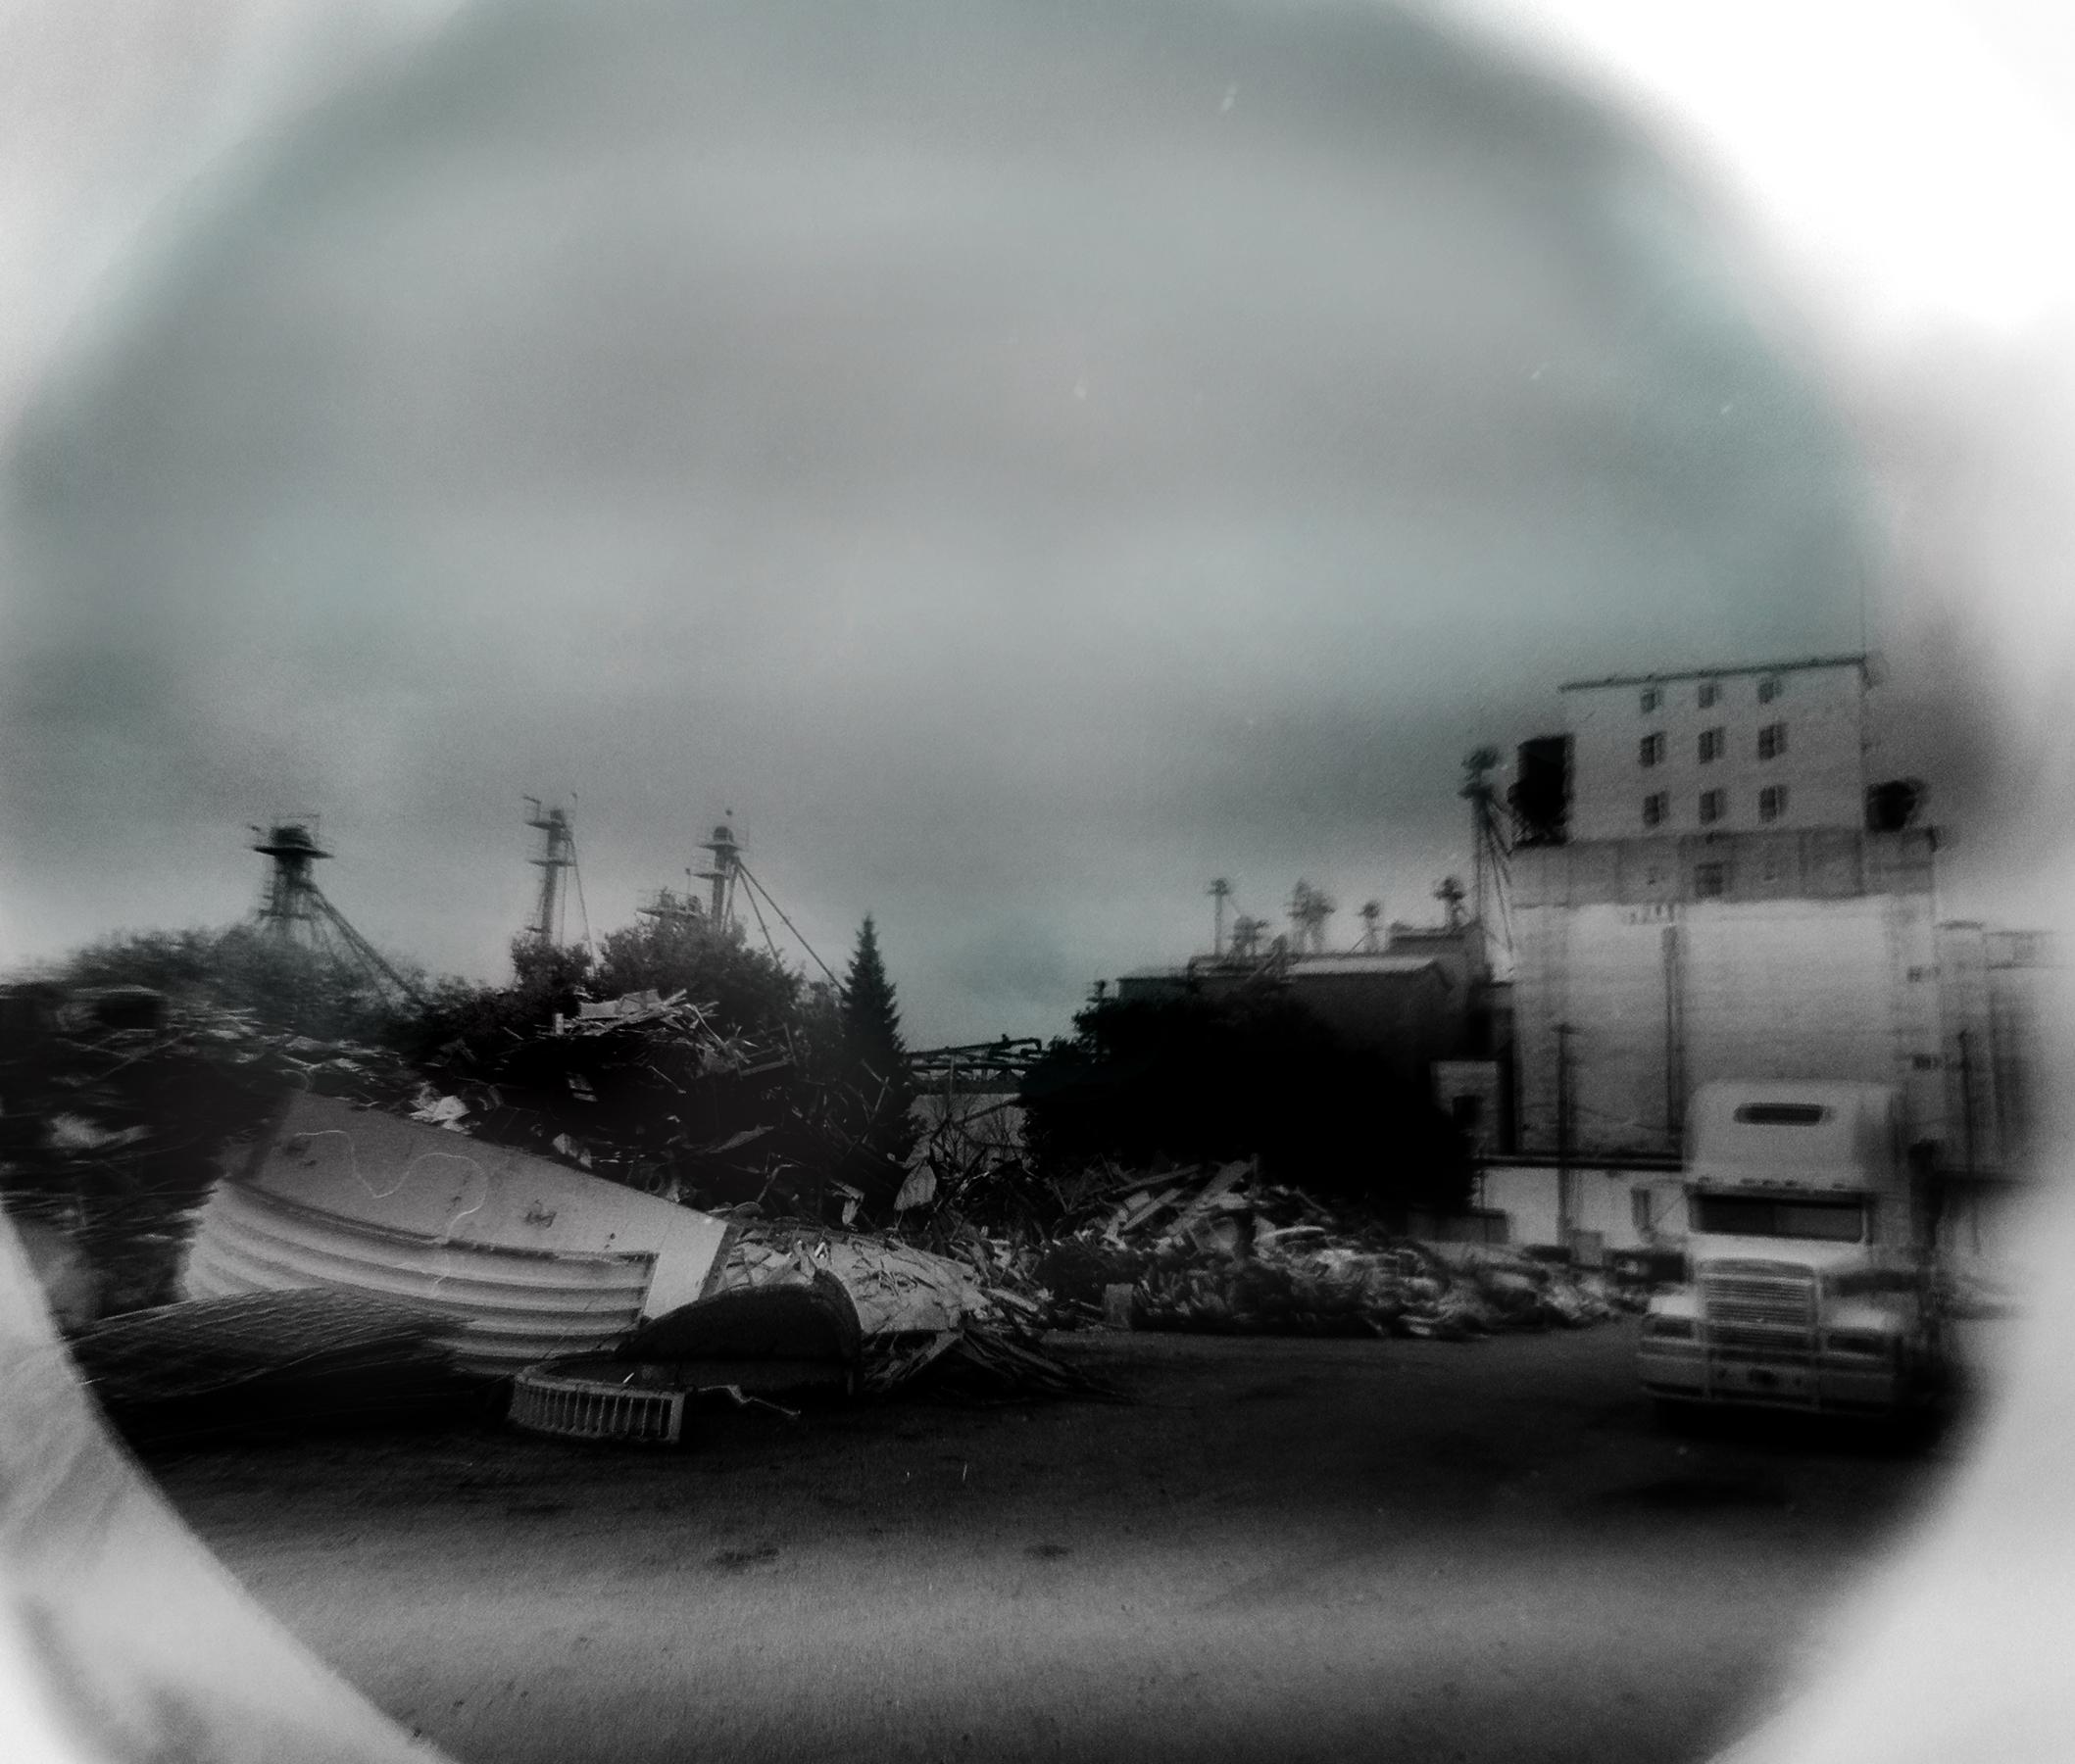 Landscape-maybe-junkyard-JPG.jpg